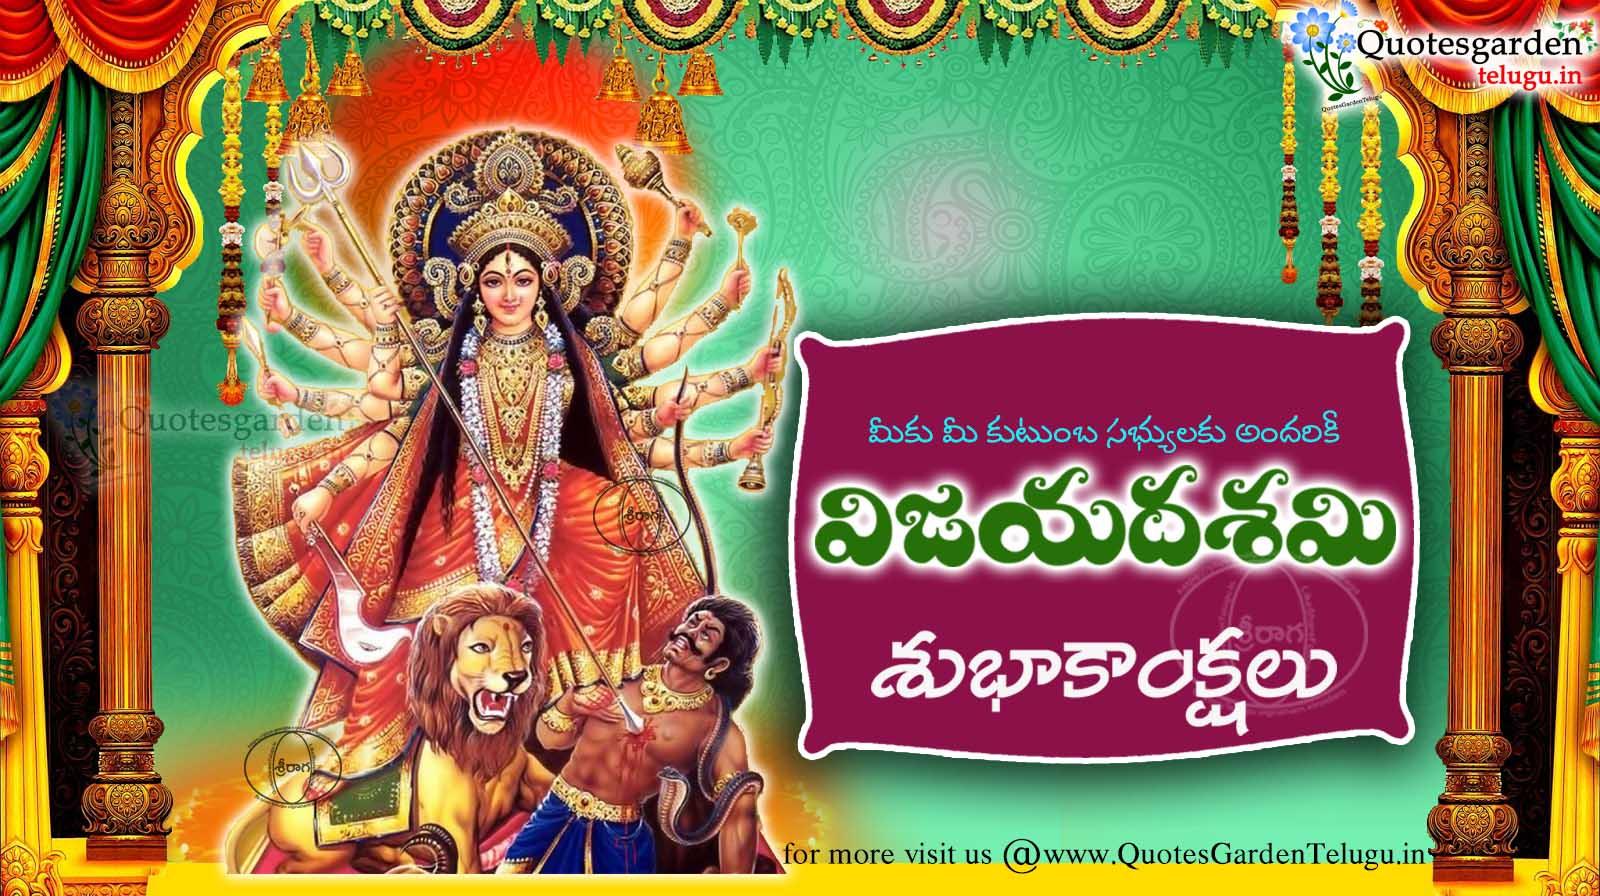 Happy dussehra 2017 greetings wishes in telugu quotes garden happy dussehra 2017 greetings wishes in telugu m4hsunfo